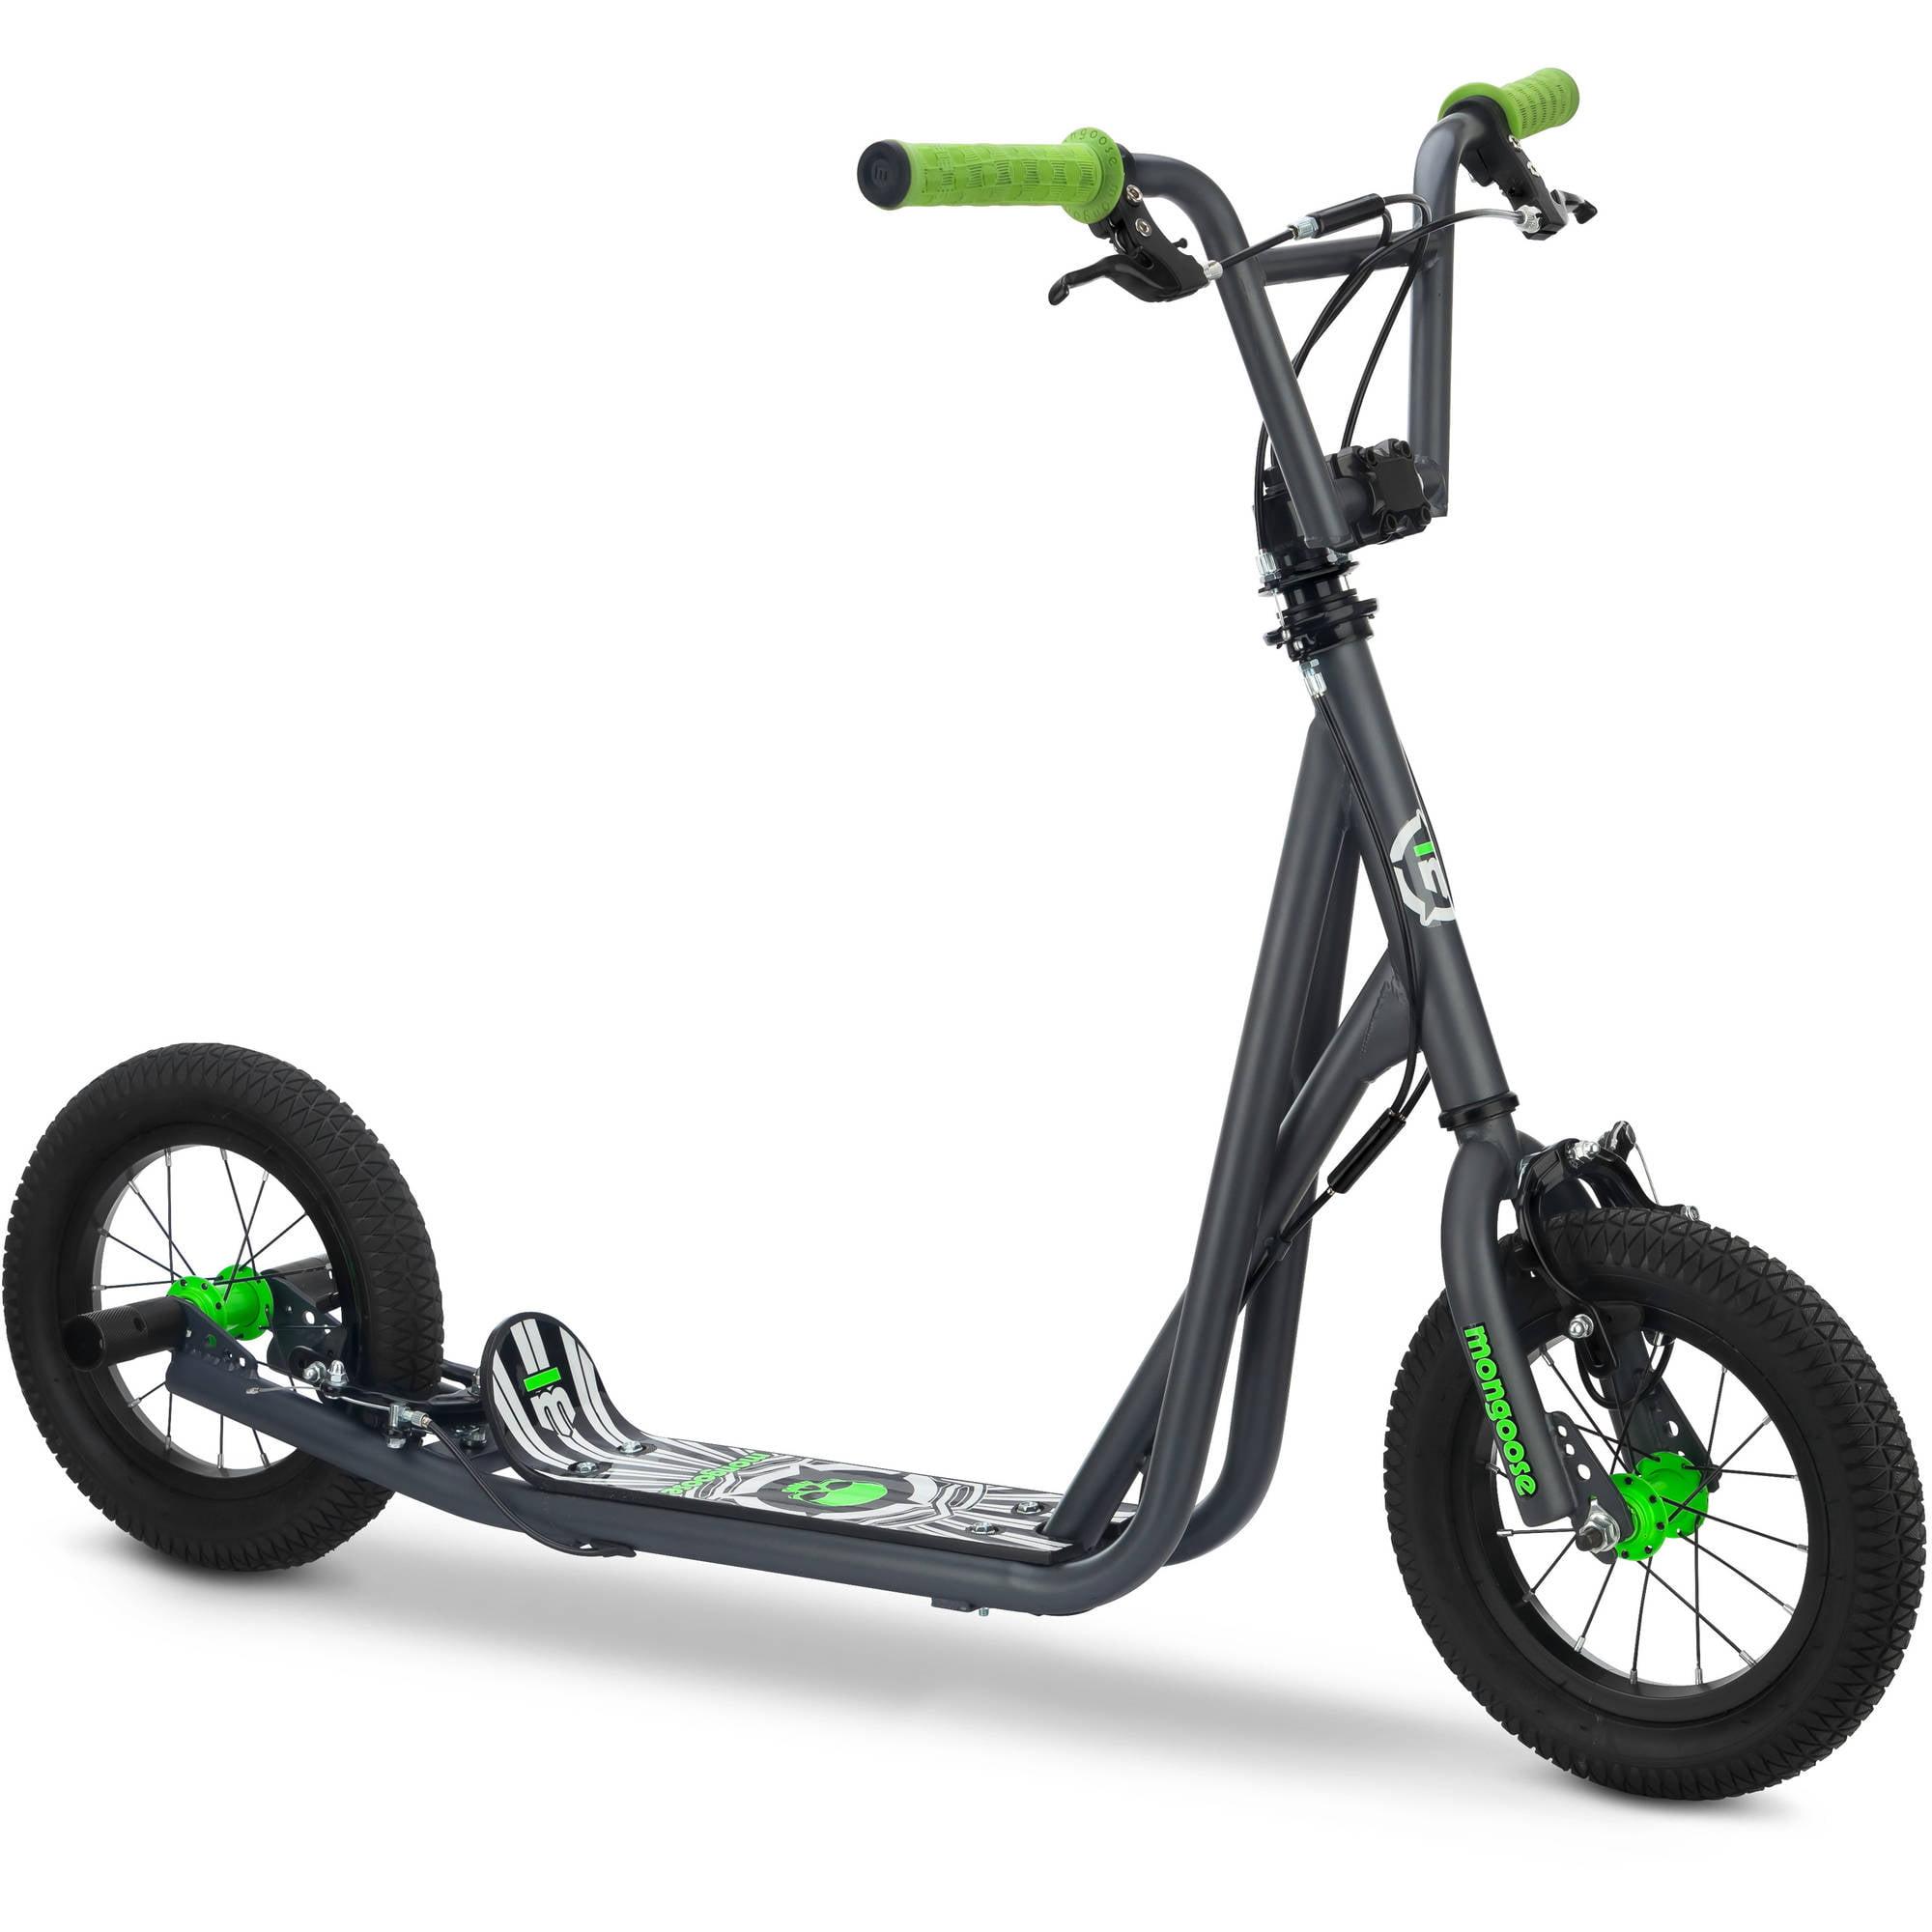 12u0022 Mongoose Expo Scooter - Grey/green